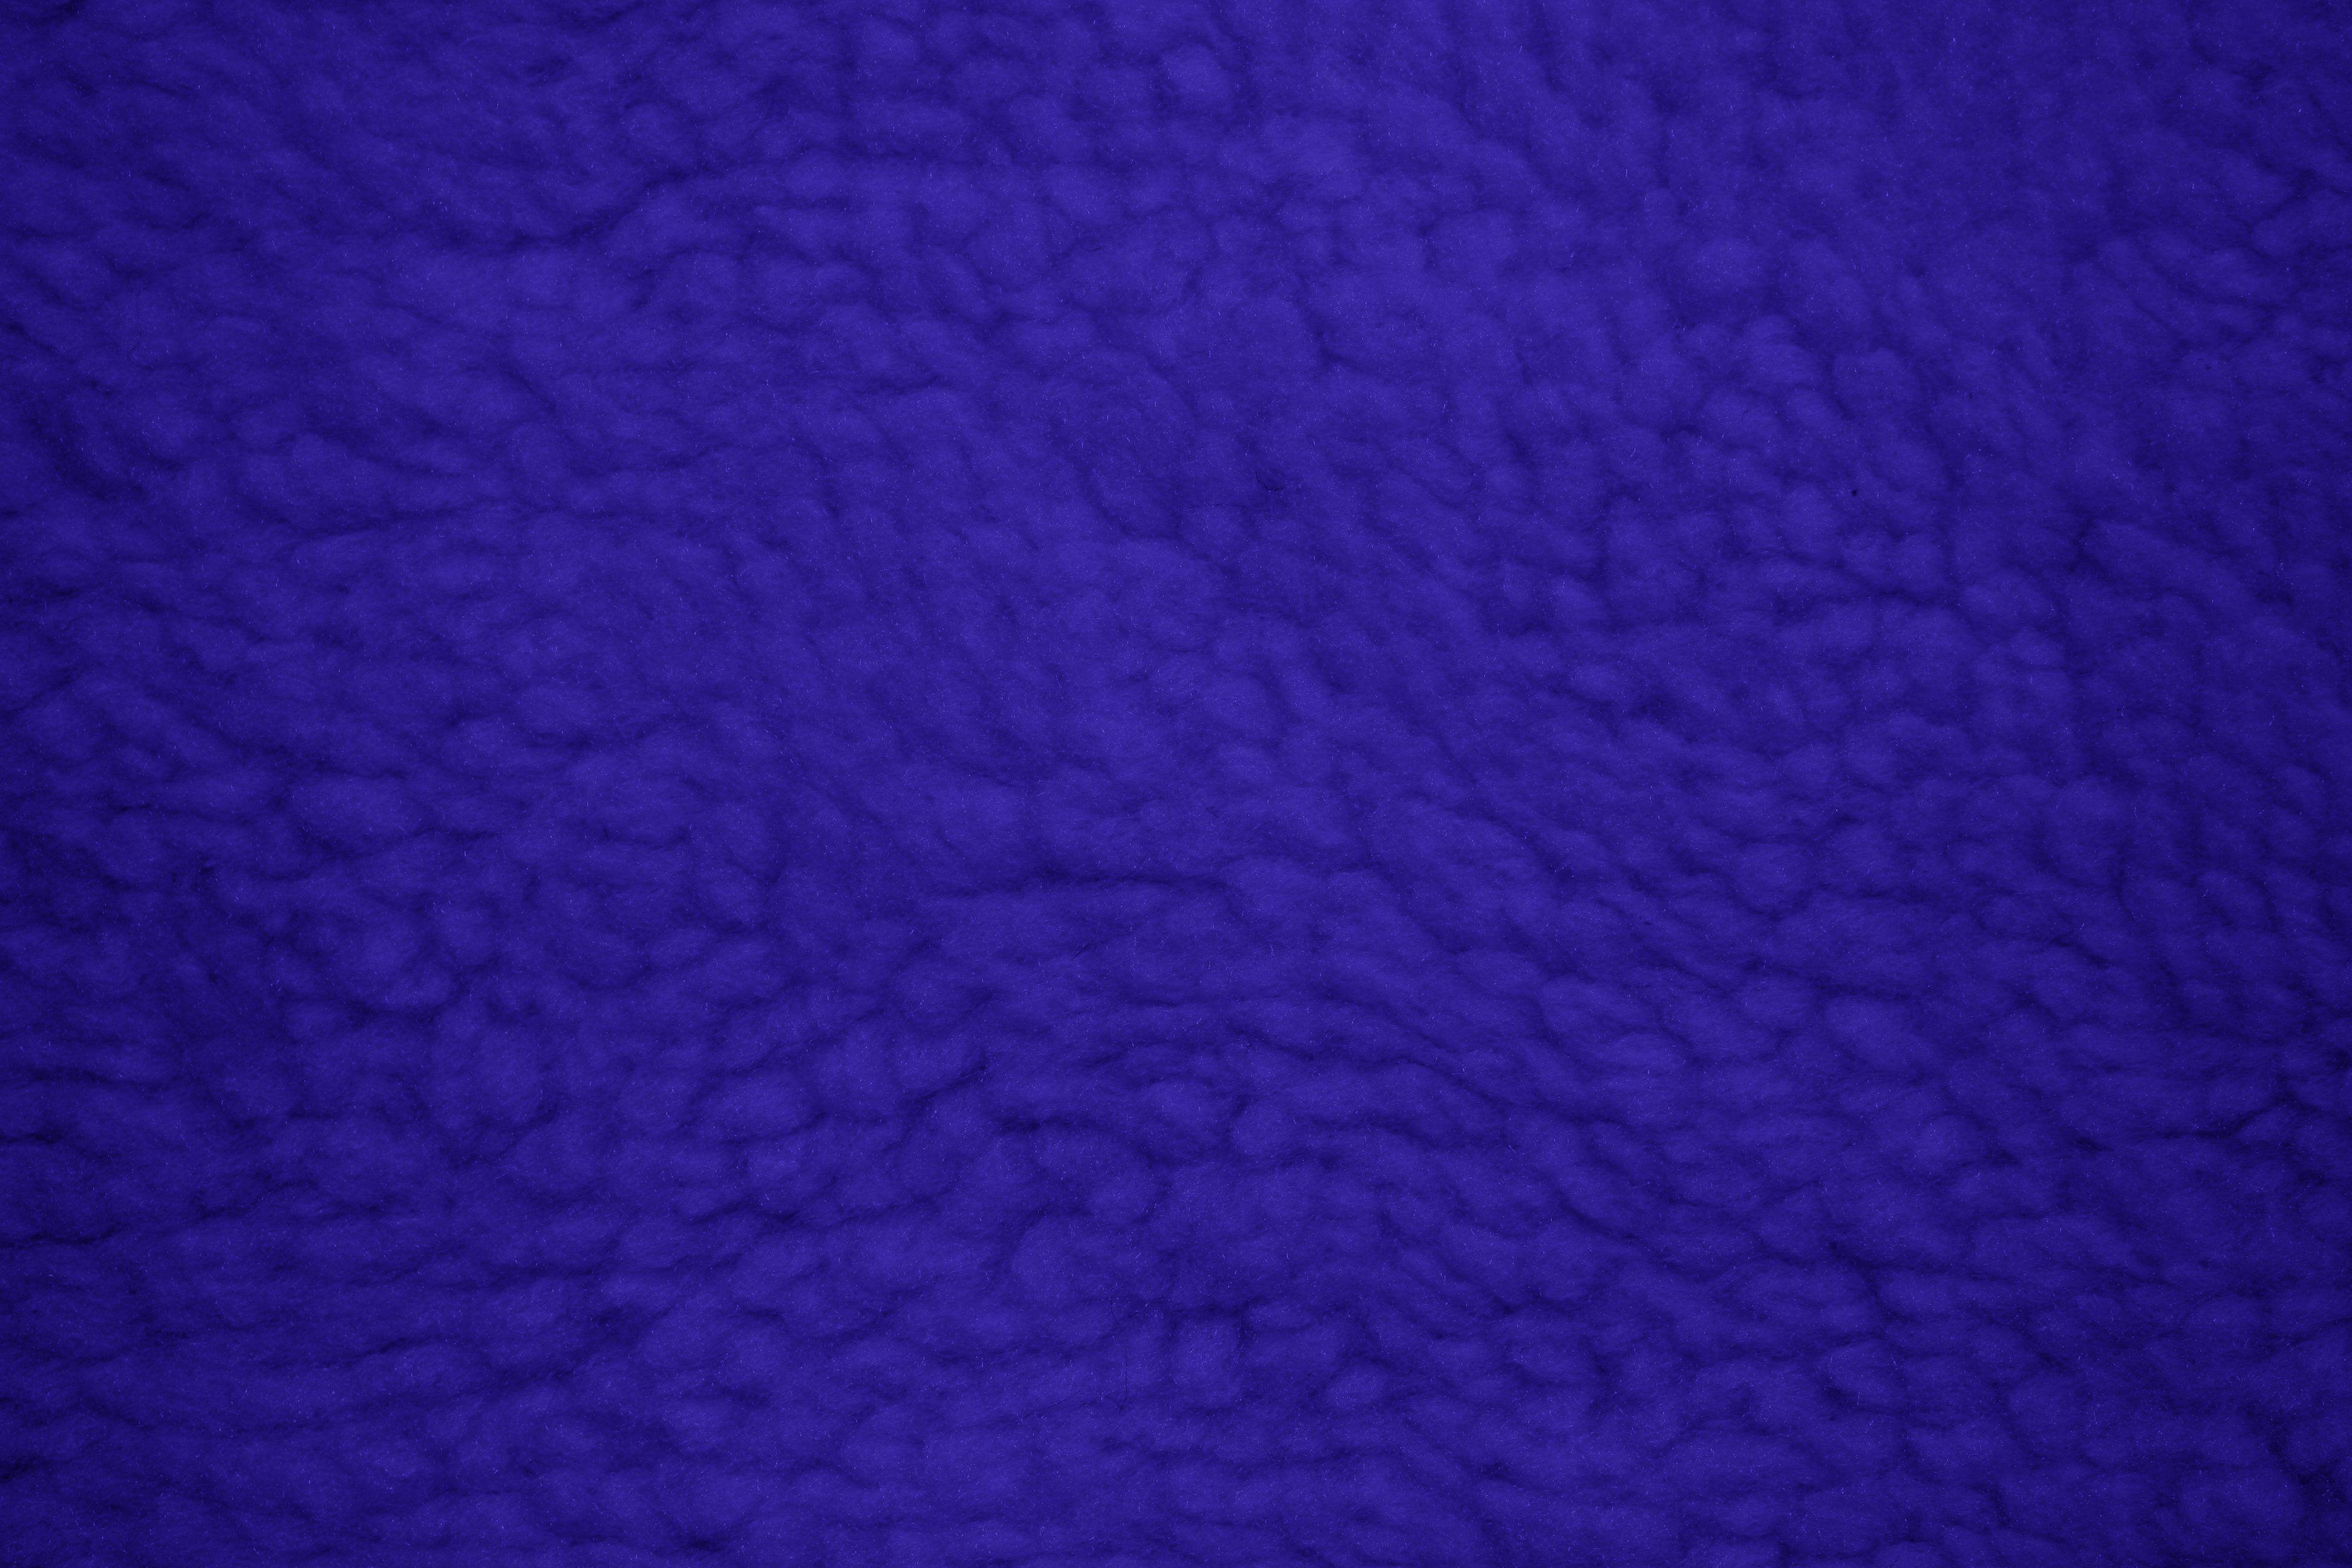 royal blue wallpaper tumblr - photo #41